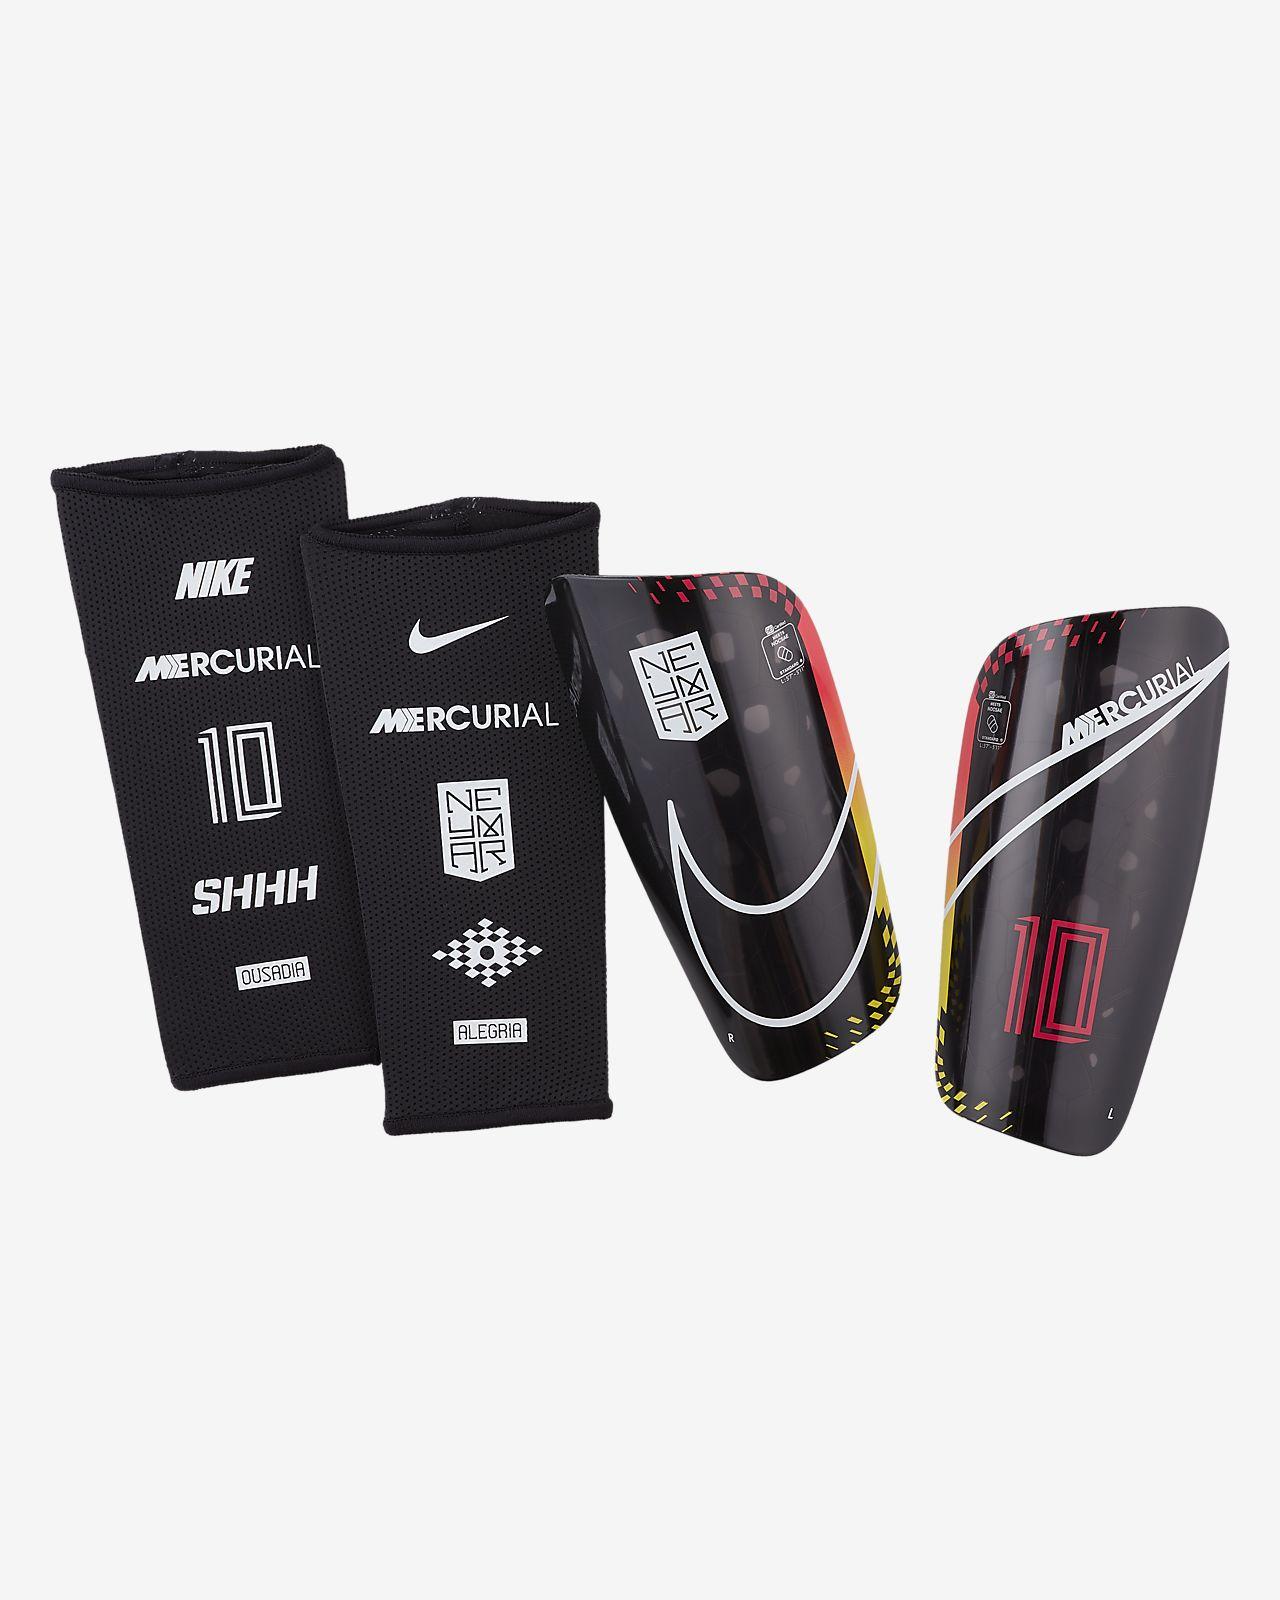 Protège-tibias de football Nike Mercurial Lite Neymar Jr.